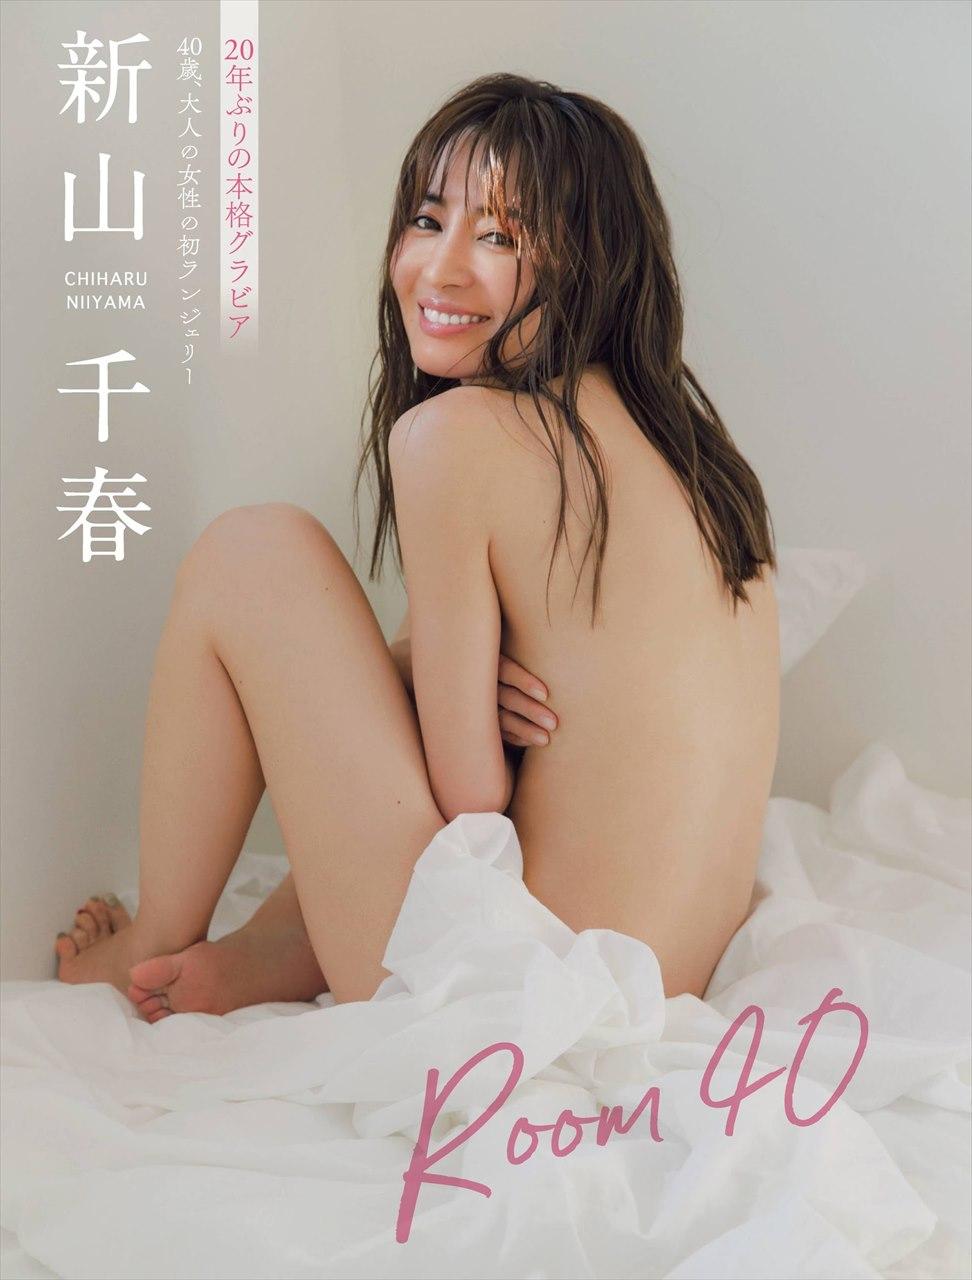 Niiyama Chiharu 新山千春